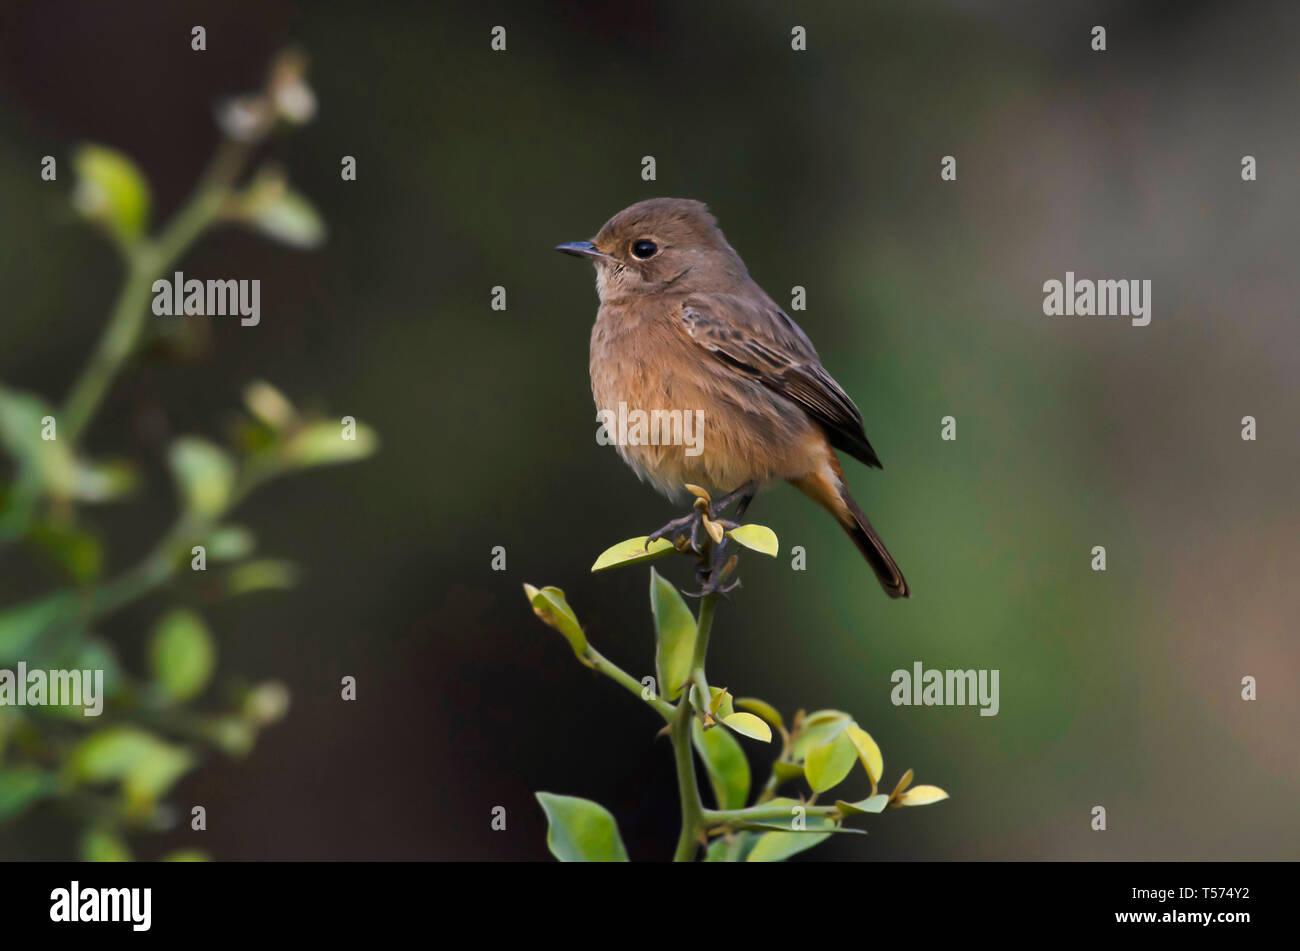 Stonechat, Saxicola rubicola, Keoladeo National Park, Bharatpur, India. - Stock Image